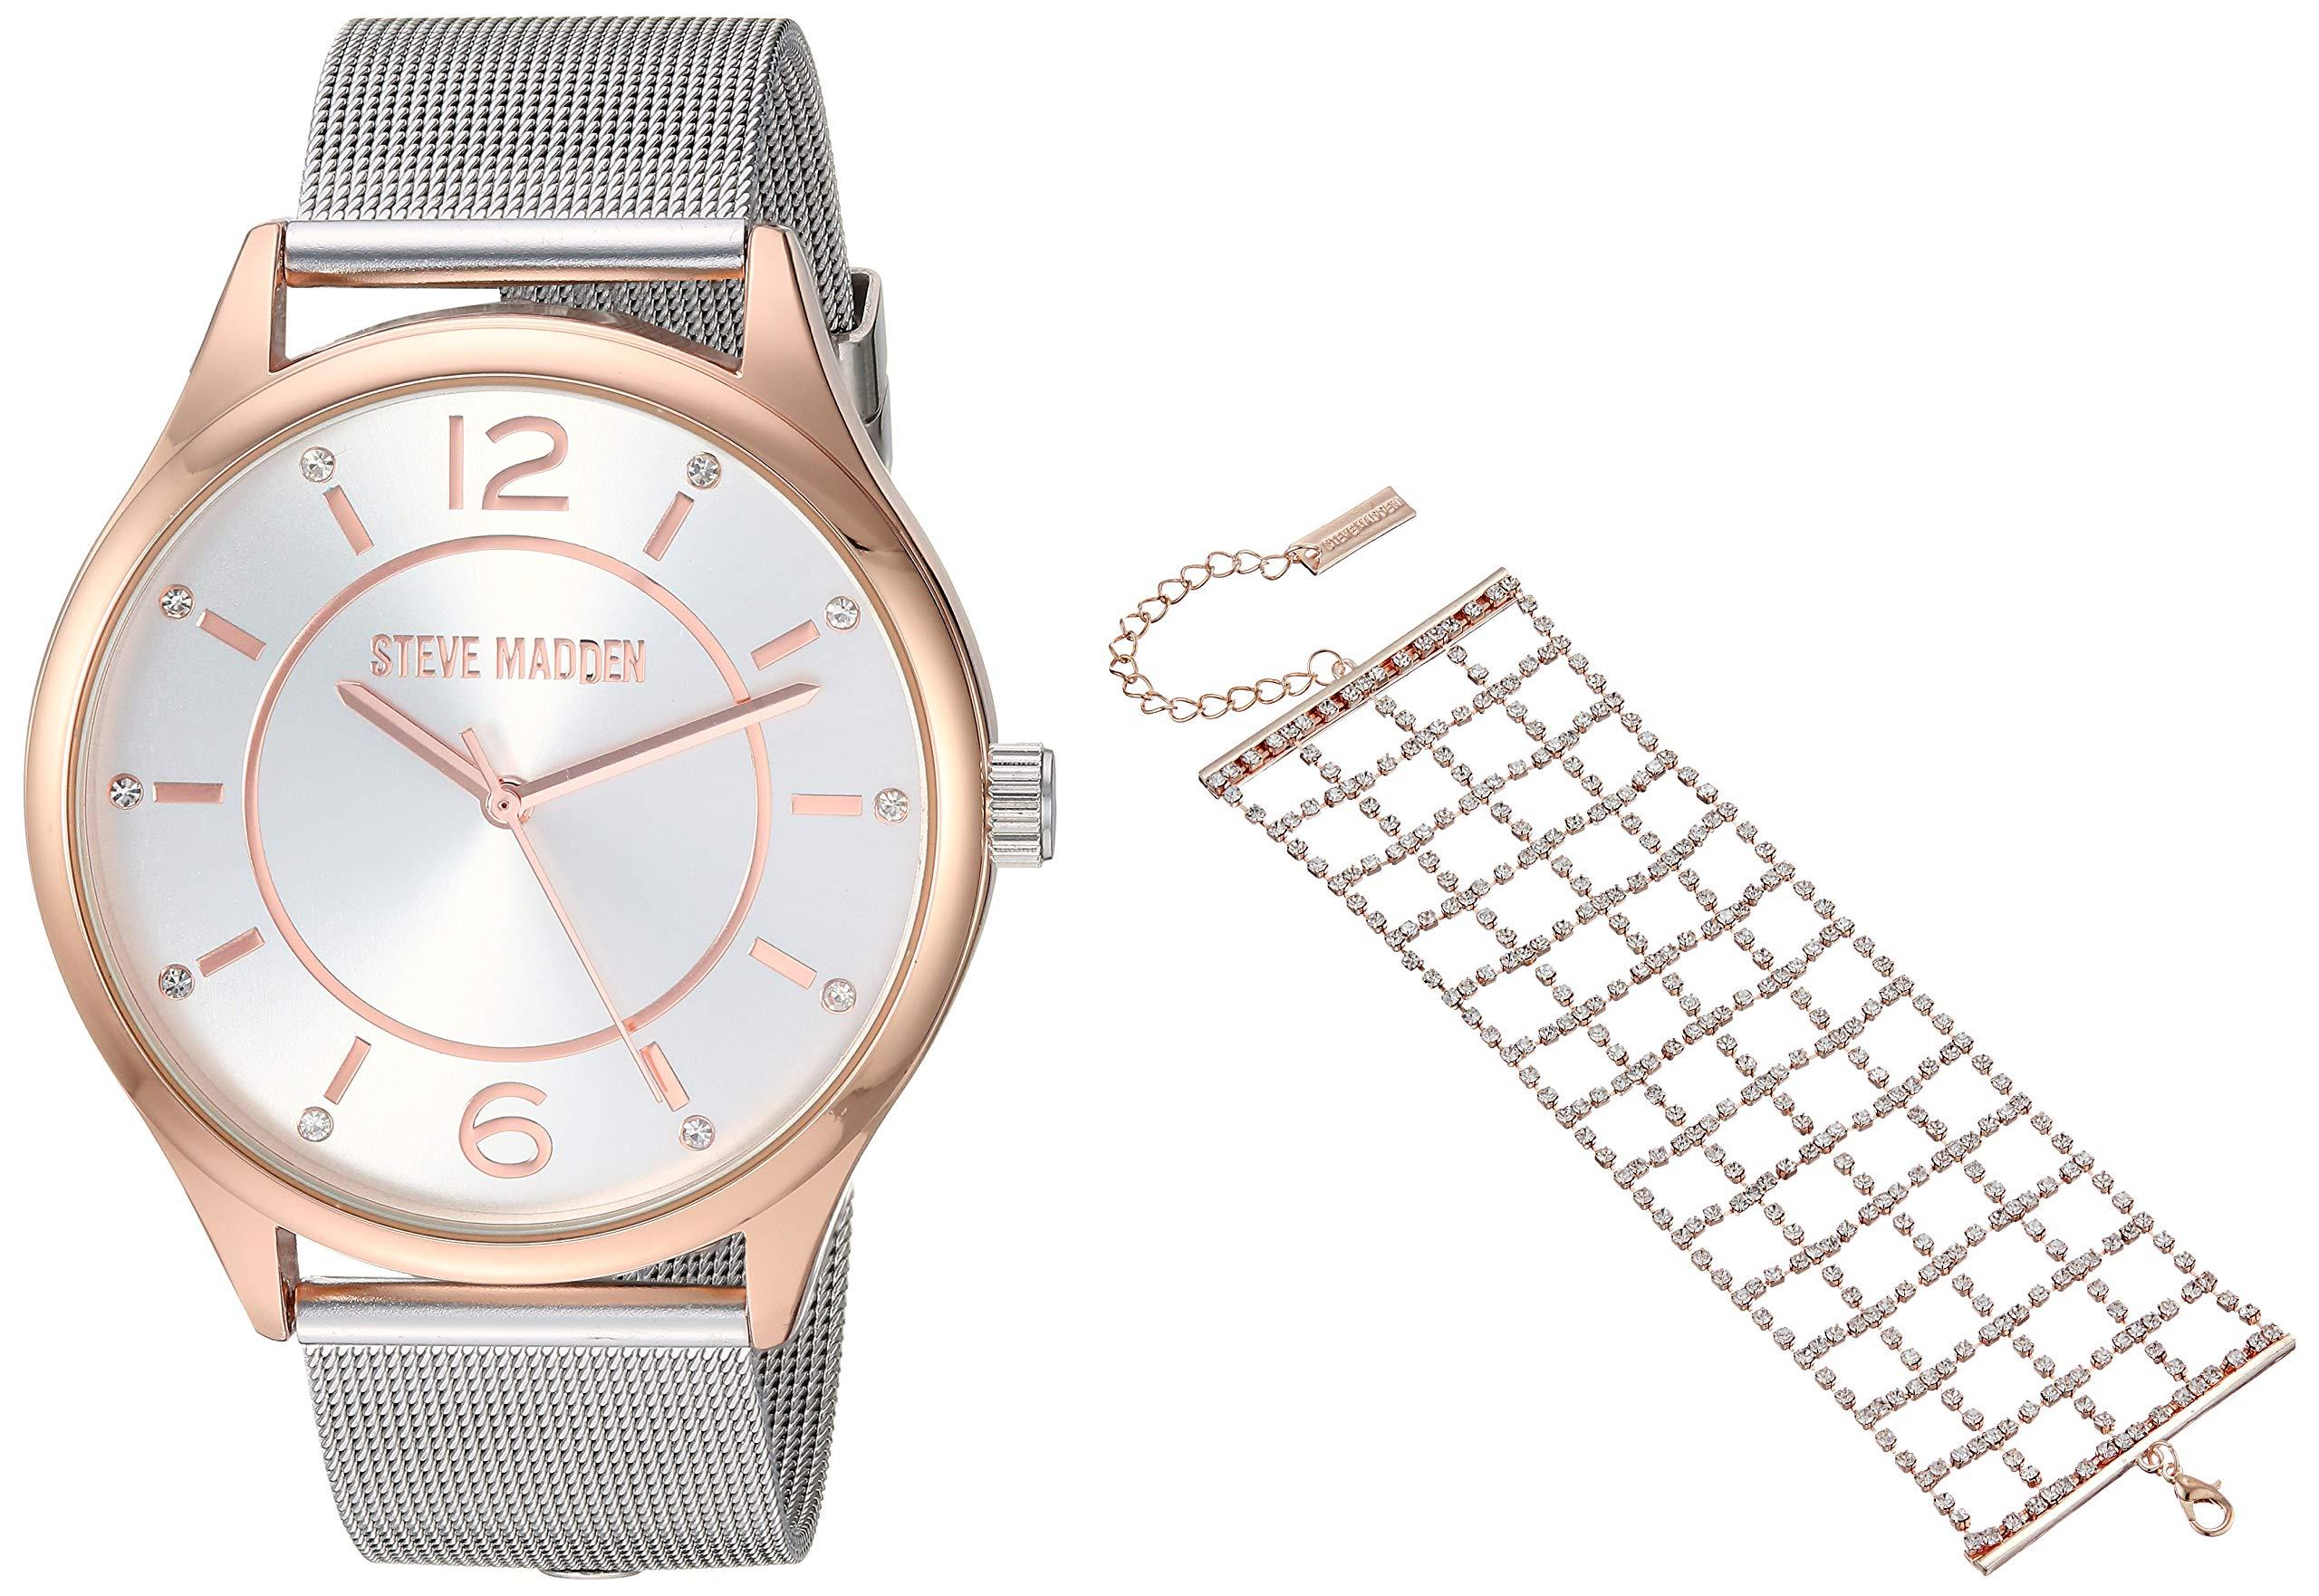 STEVE MADDEN 网眼手表带水钻格子袖口手链女式套装(多种颜色)